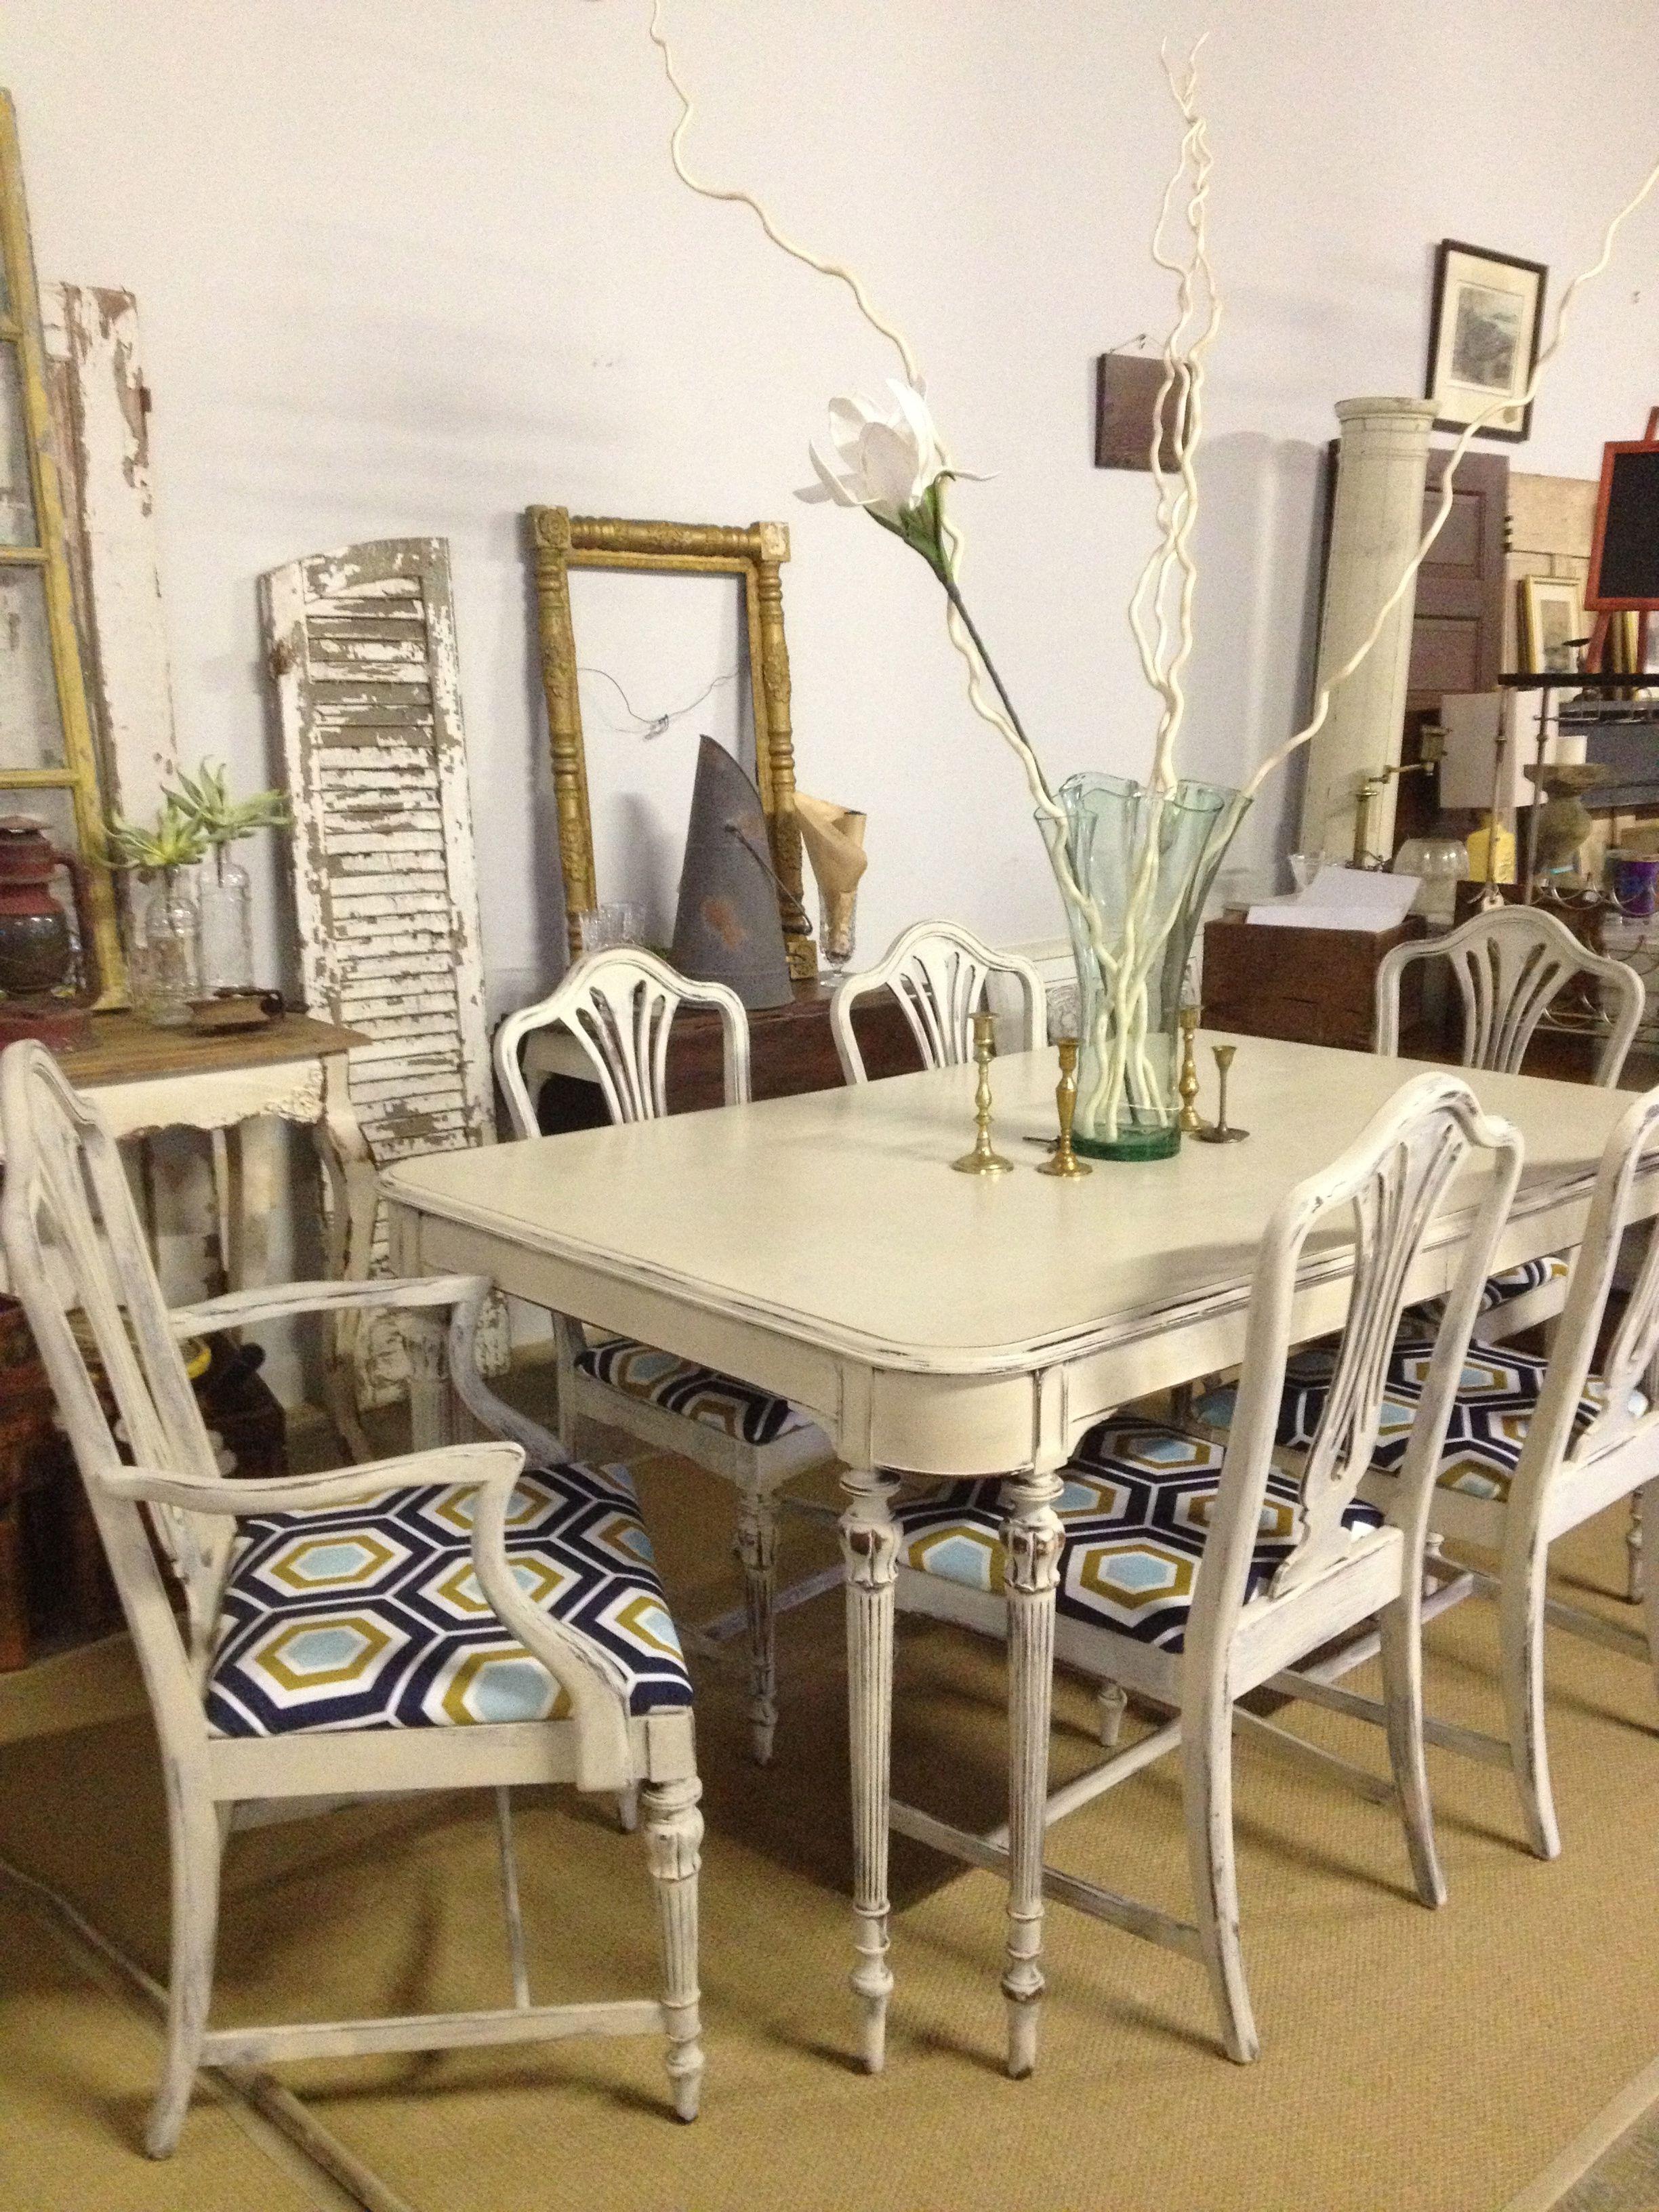 Superbe Home Decor, Stylish Patina, Falls Church Virginia, Vintage Furniture,  Www.stylishpatina.com